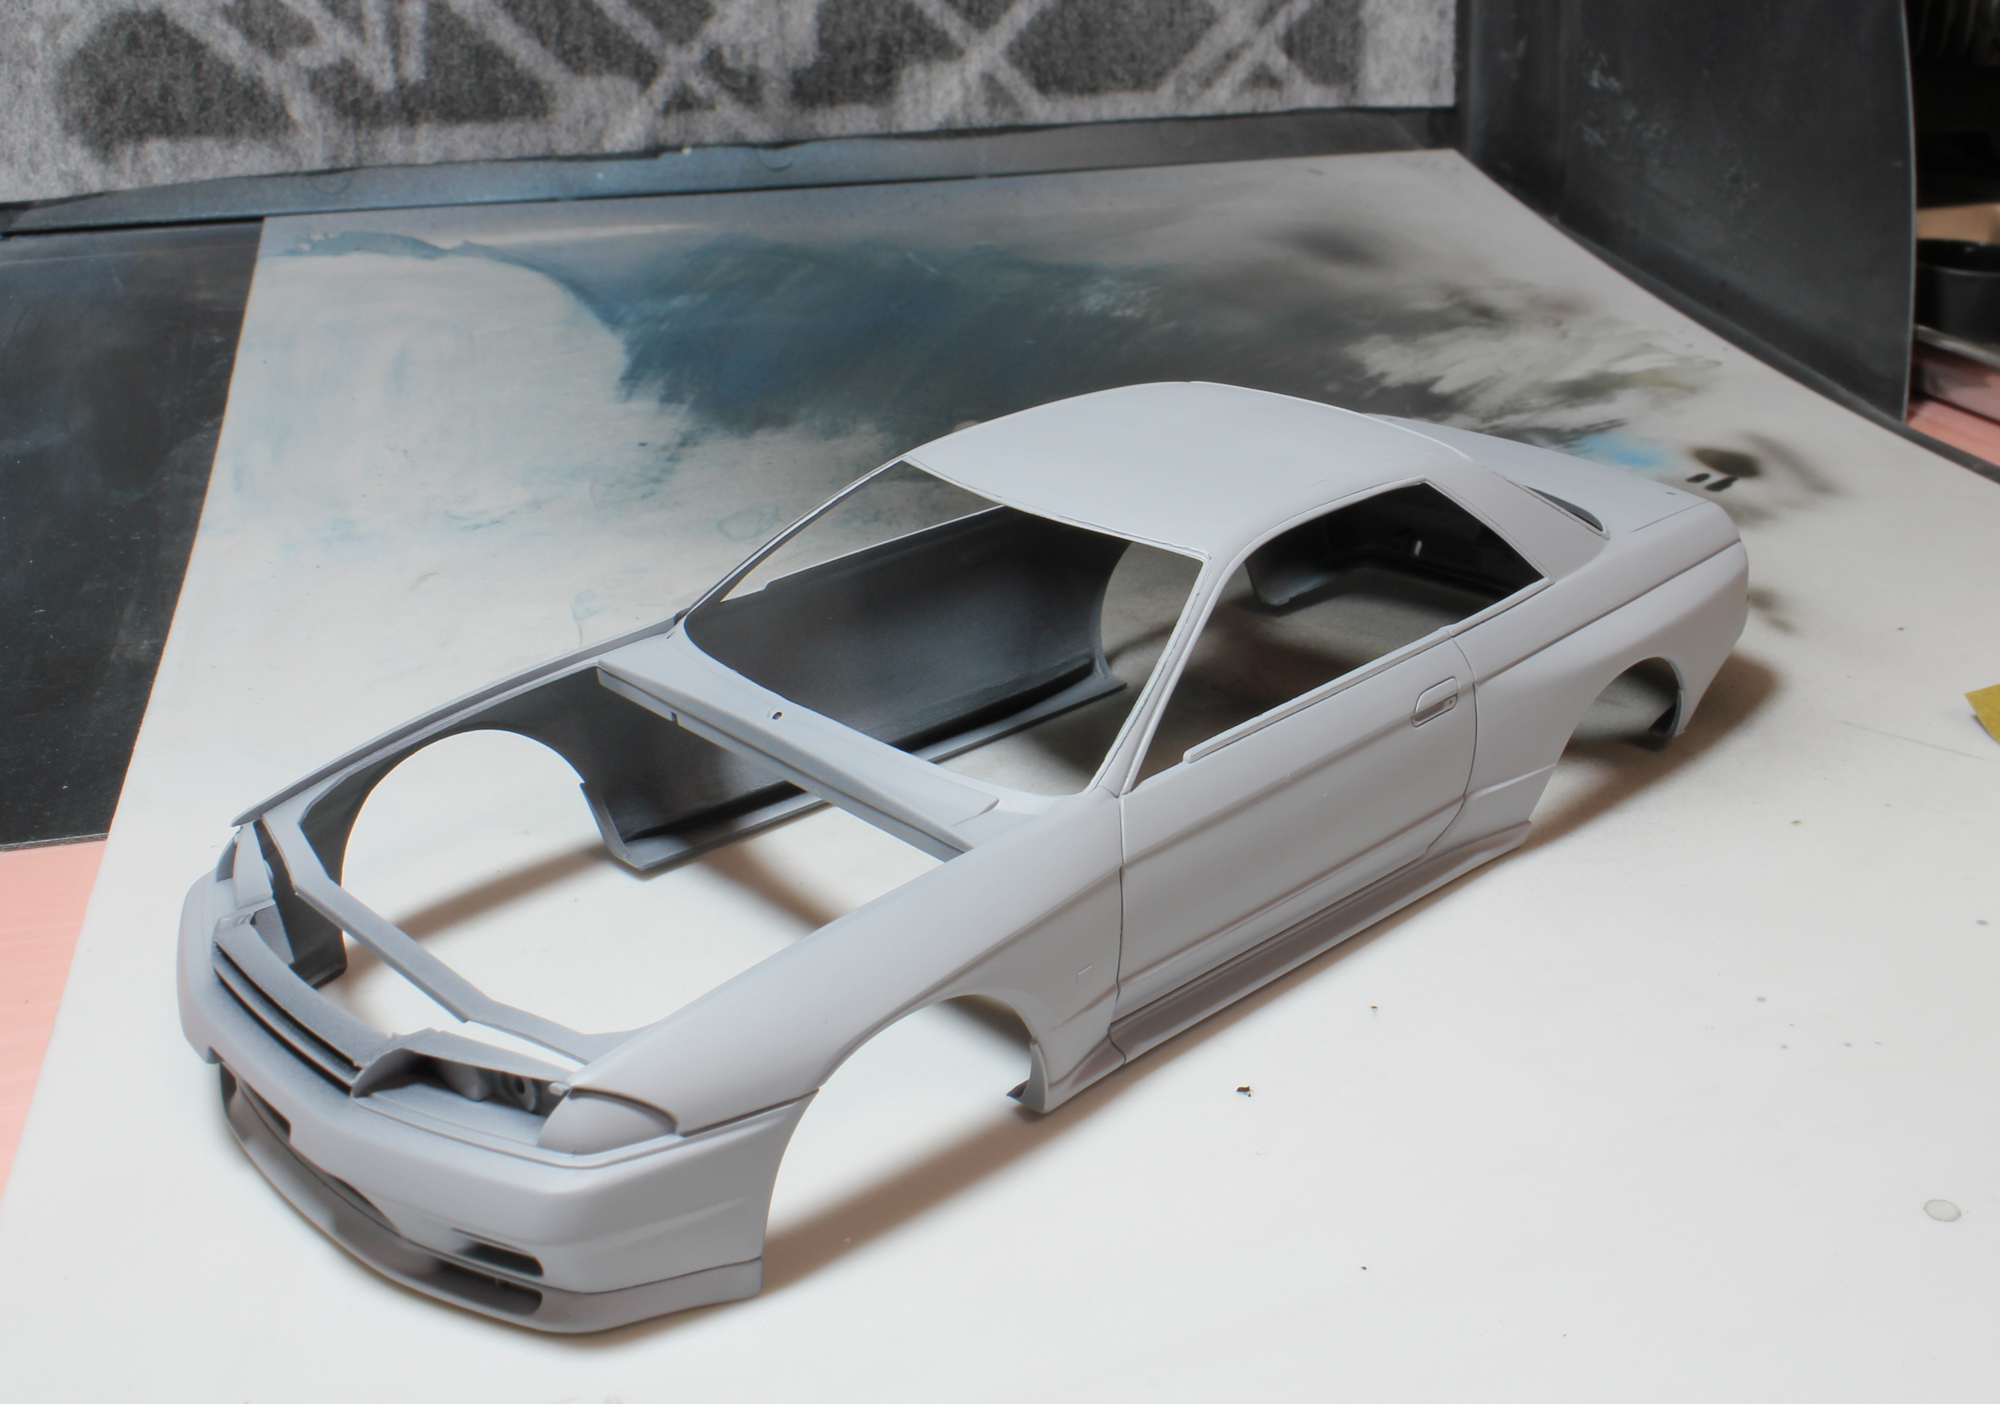 R32ボディー修正サフ後2